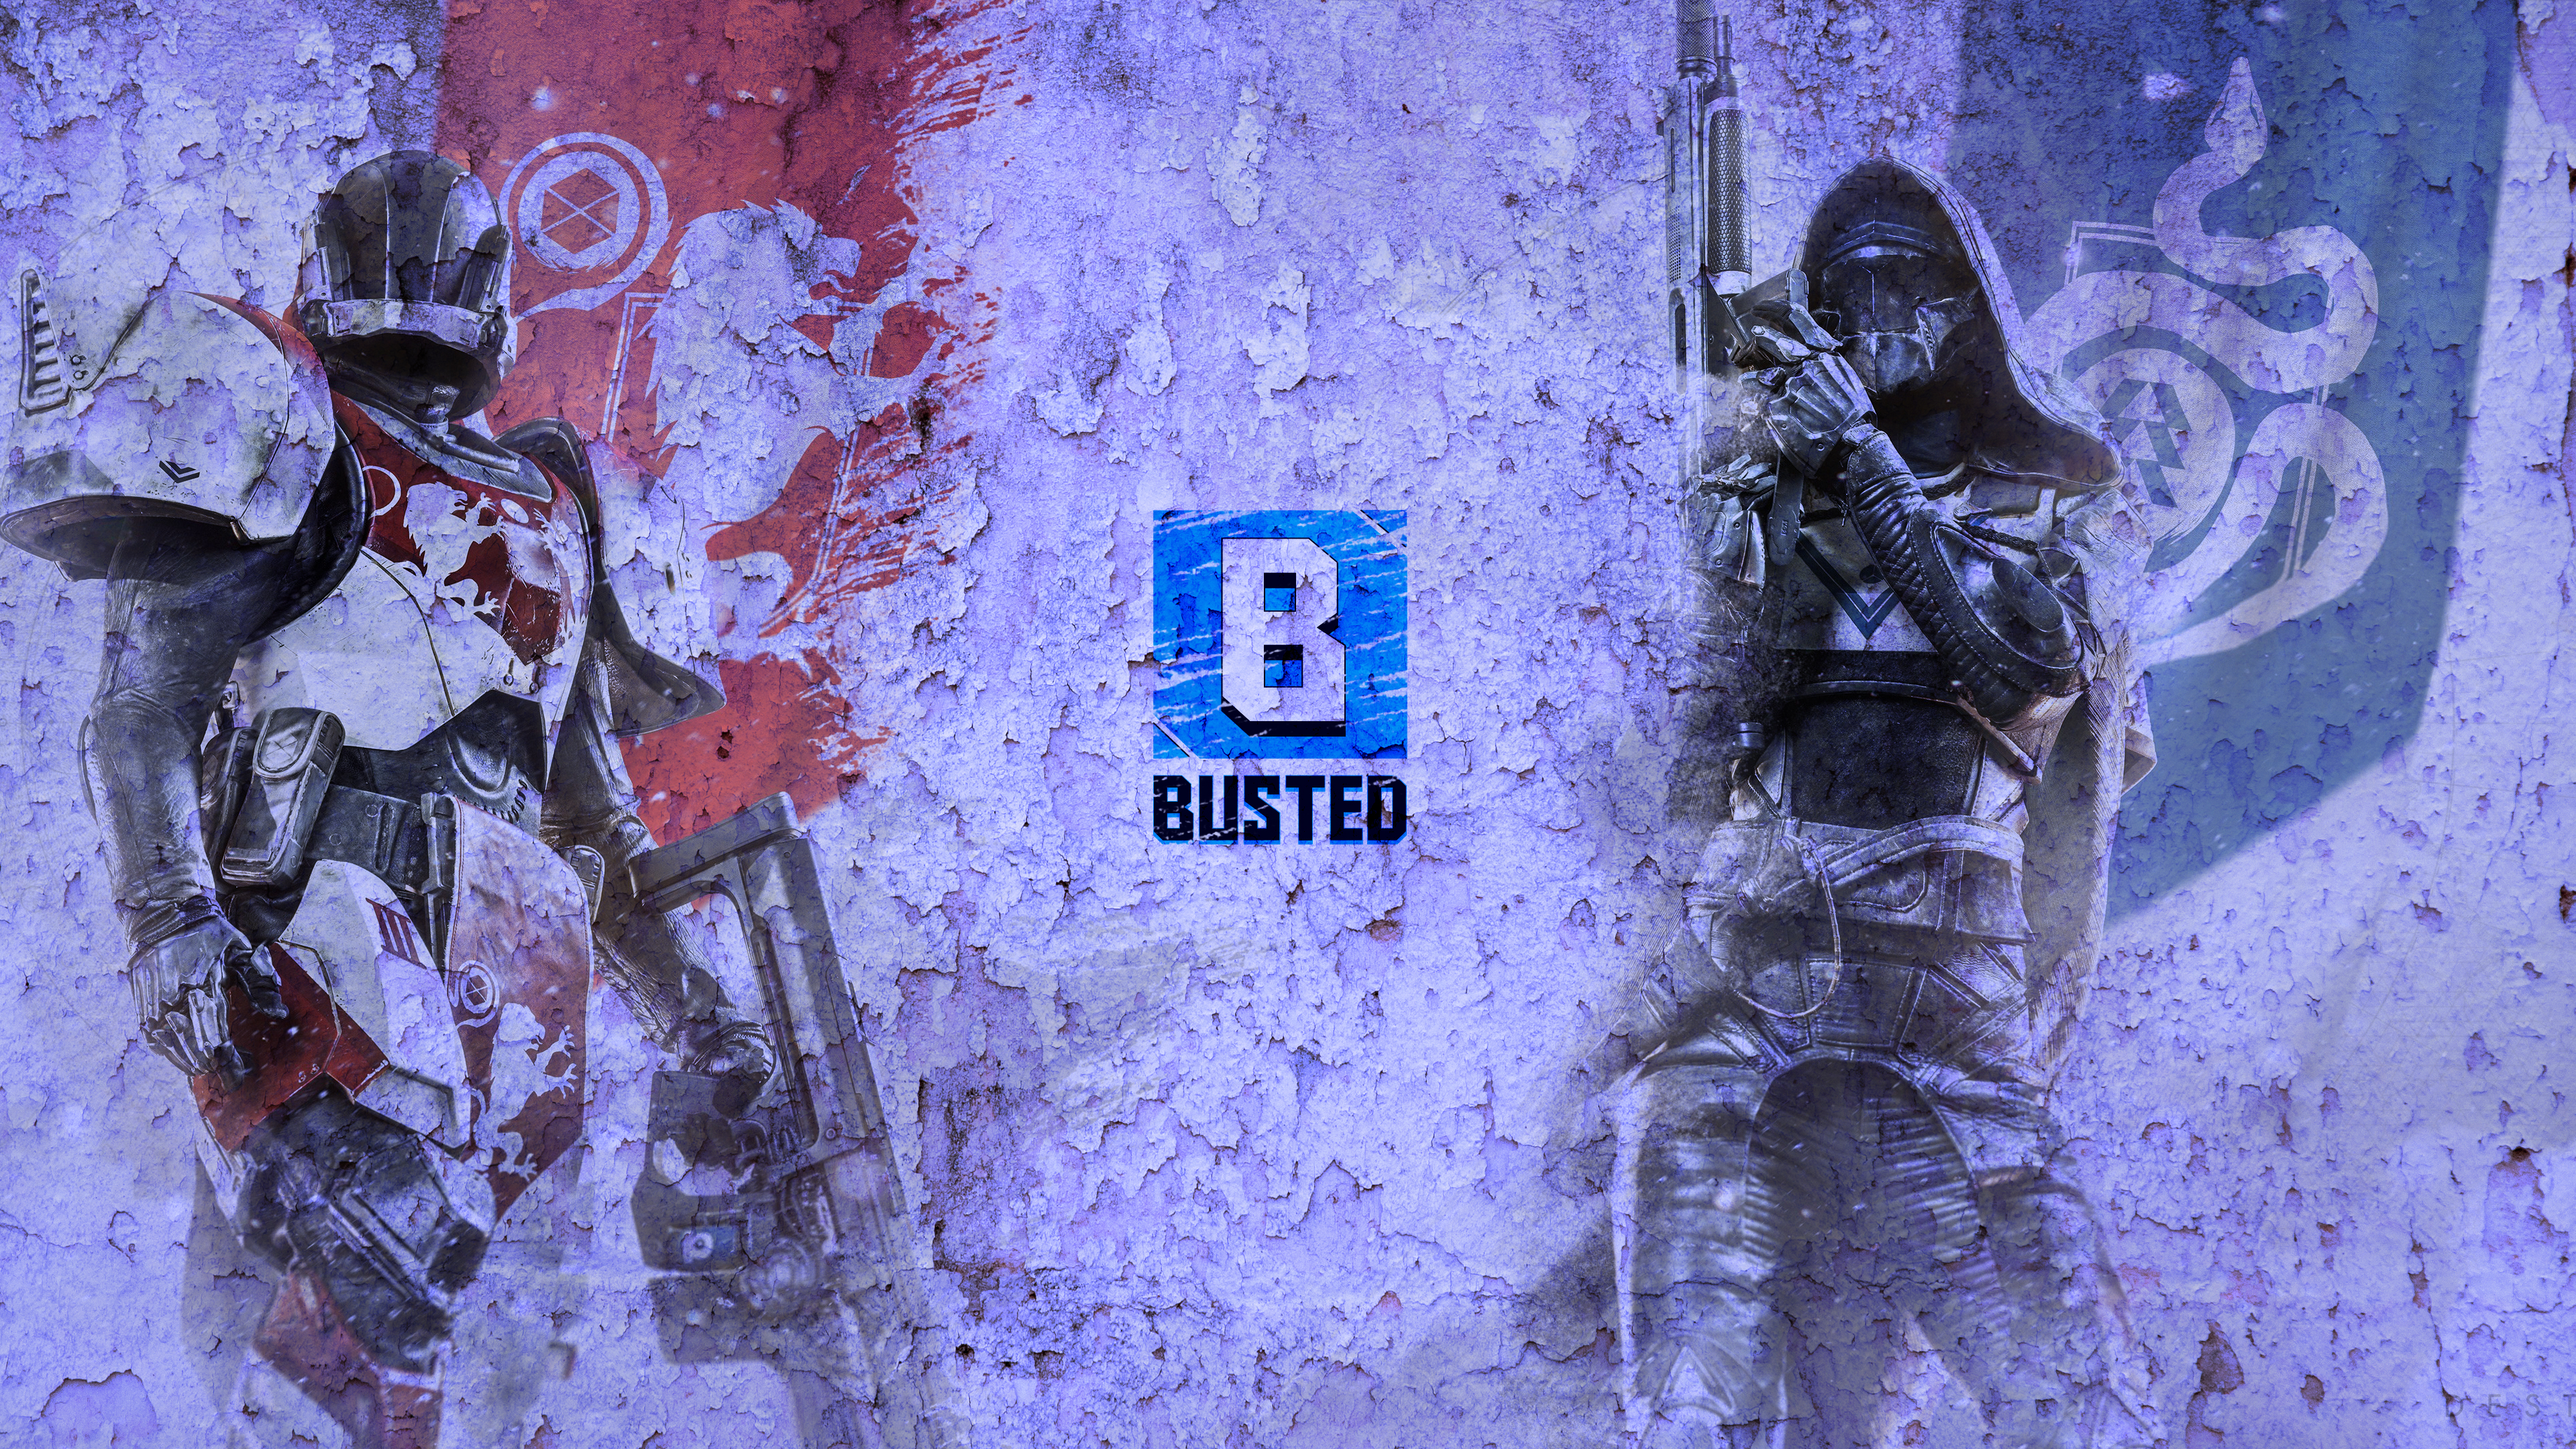 https://busted.gr/wp-content/uploads/2016/11https://busted.gr/wp-content/uploads/2016/11/destiny4k.jpg/destiny4k.jpg